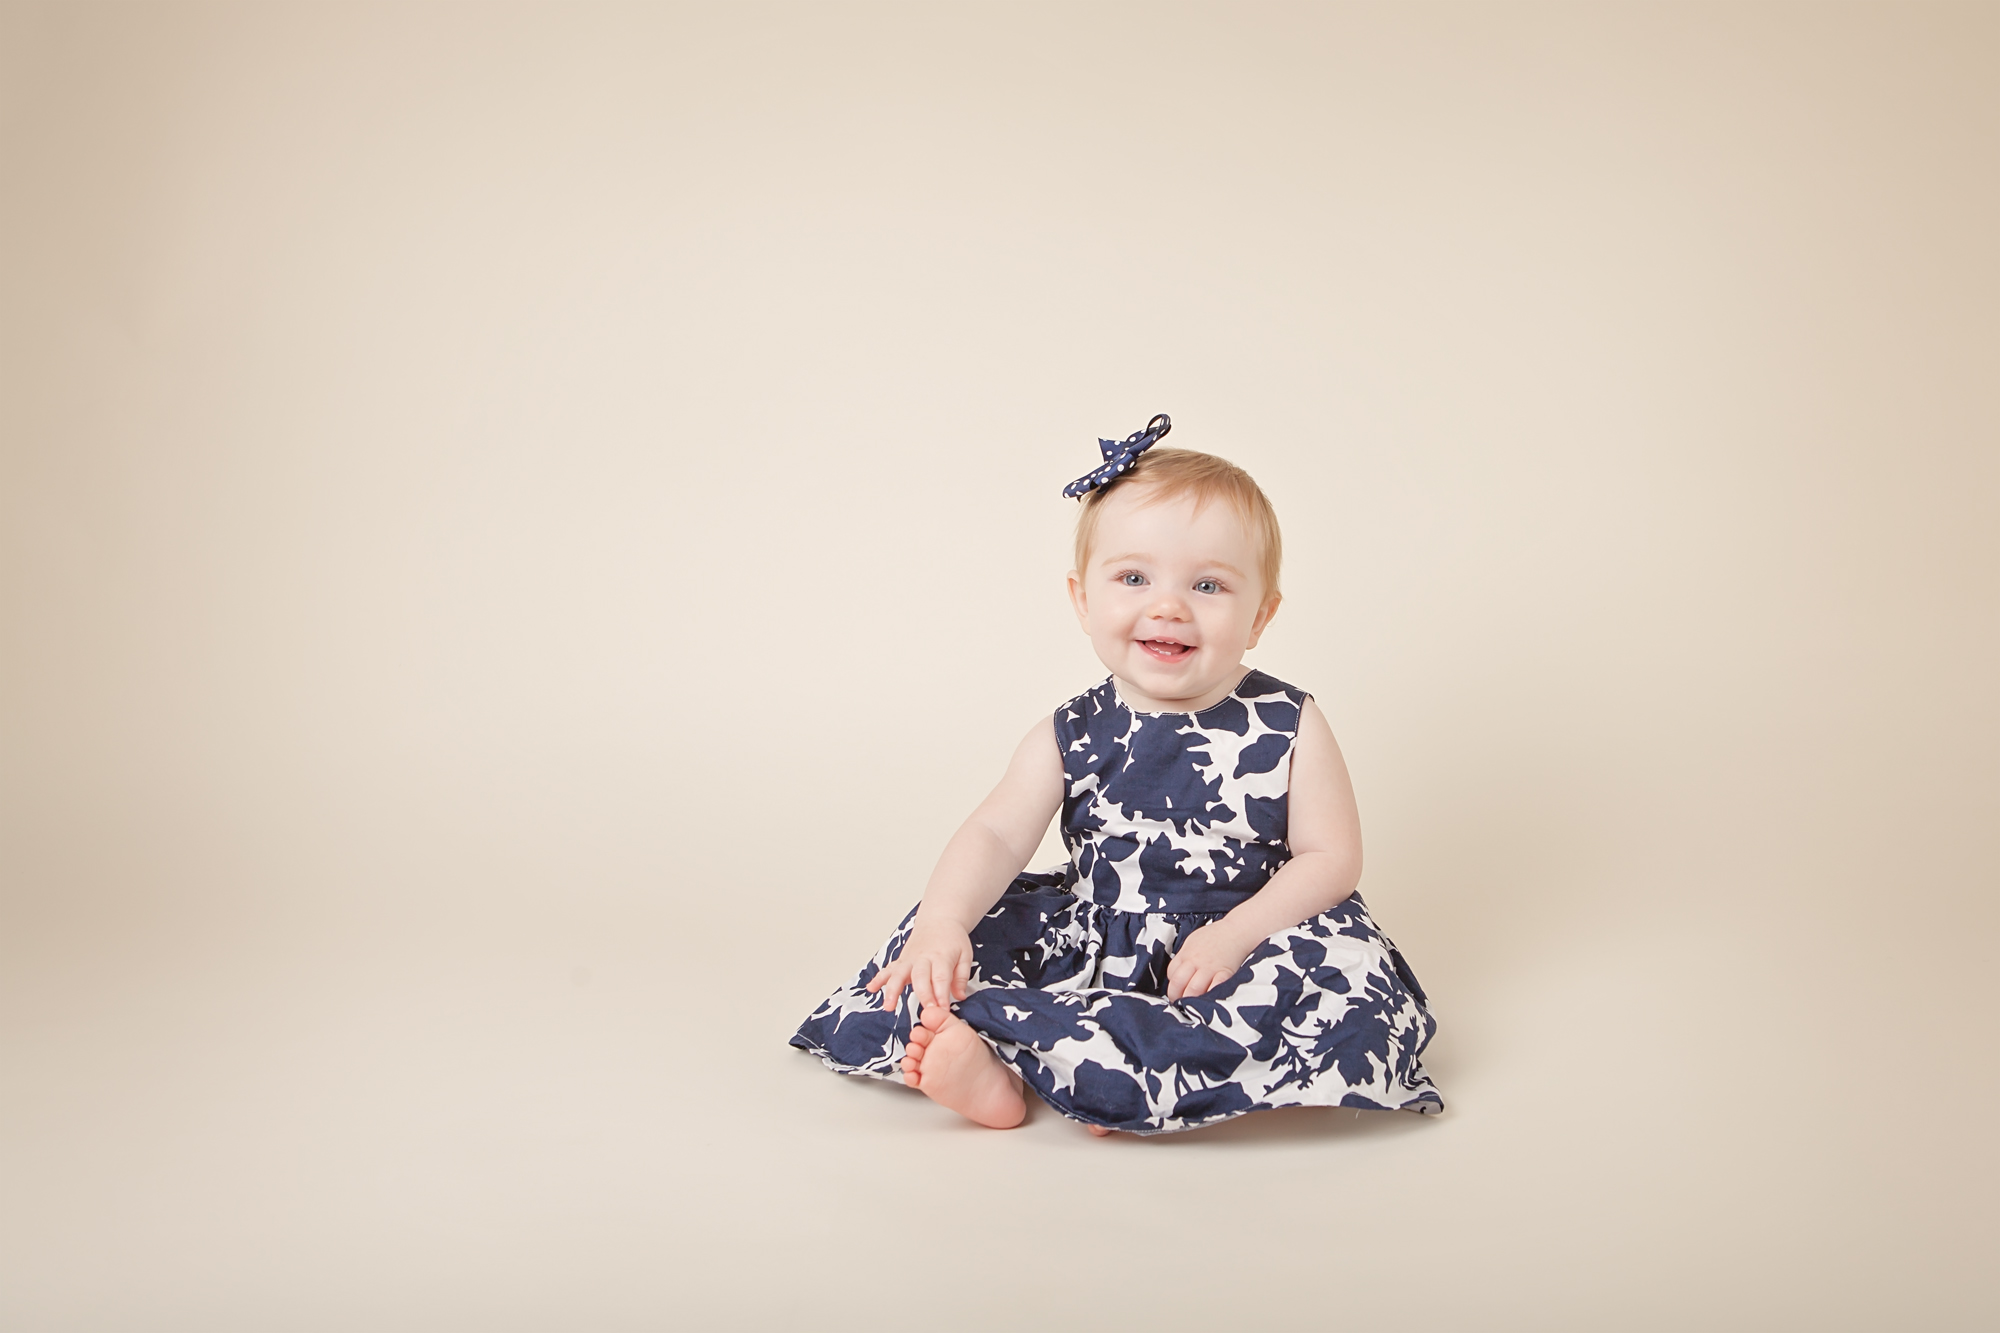 baby girl blue dress columbus oh photographer